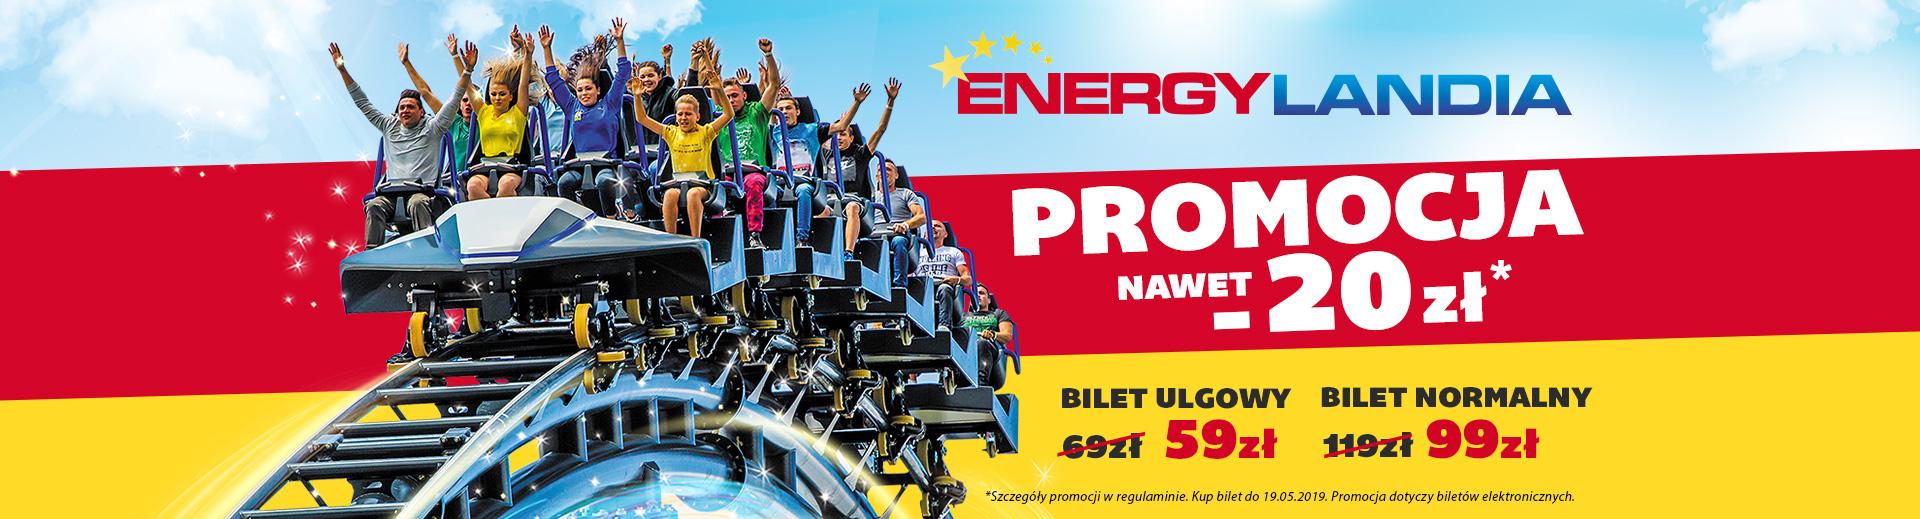 Energylandia promocja do -20zł